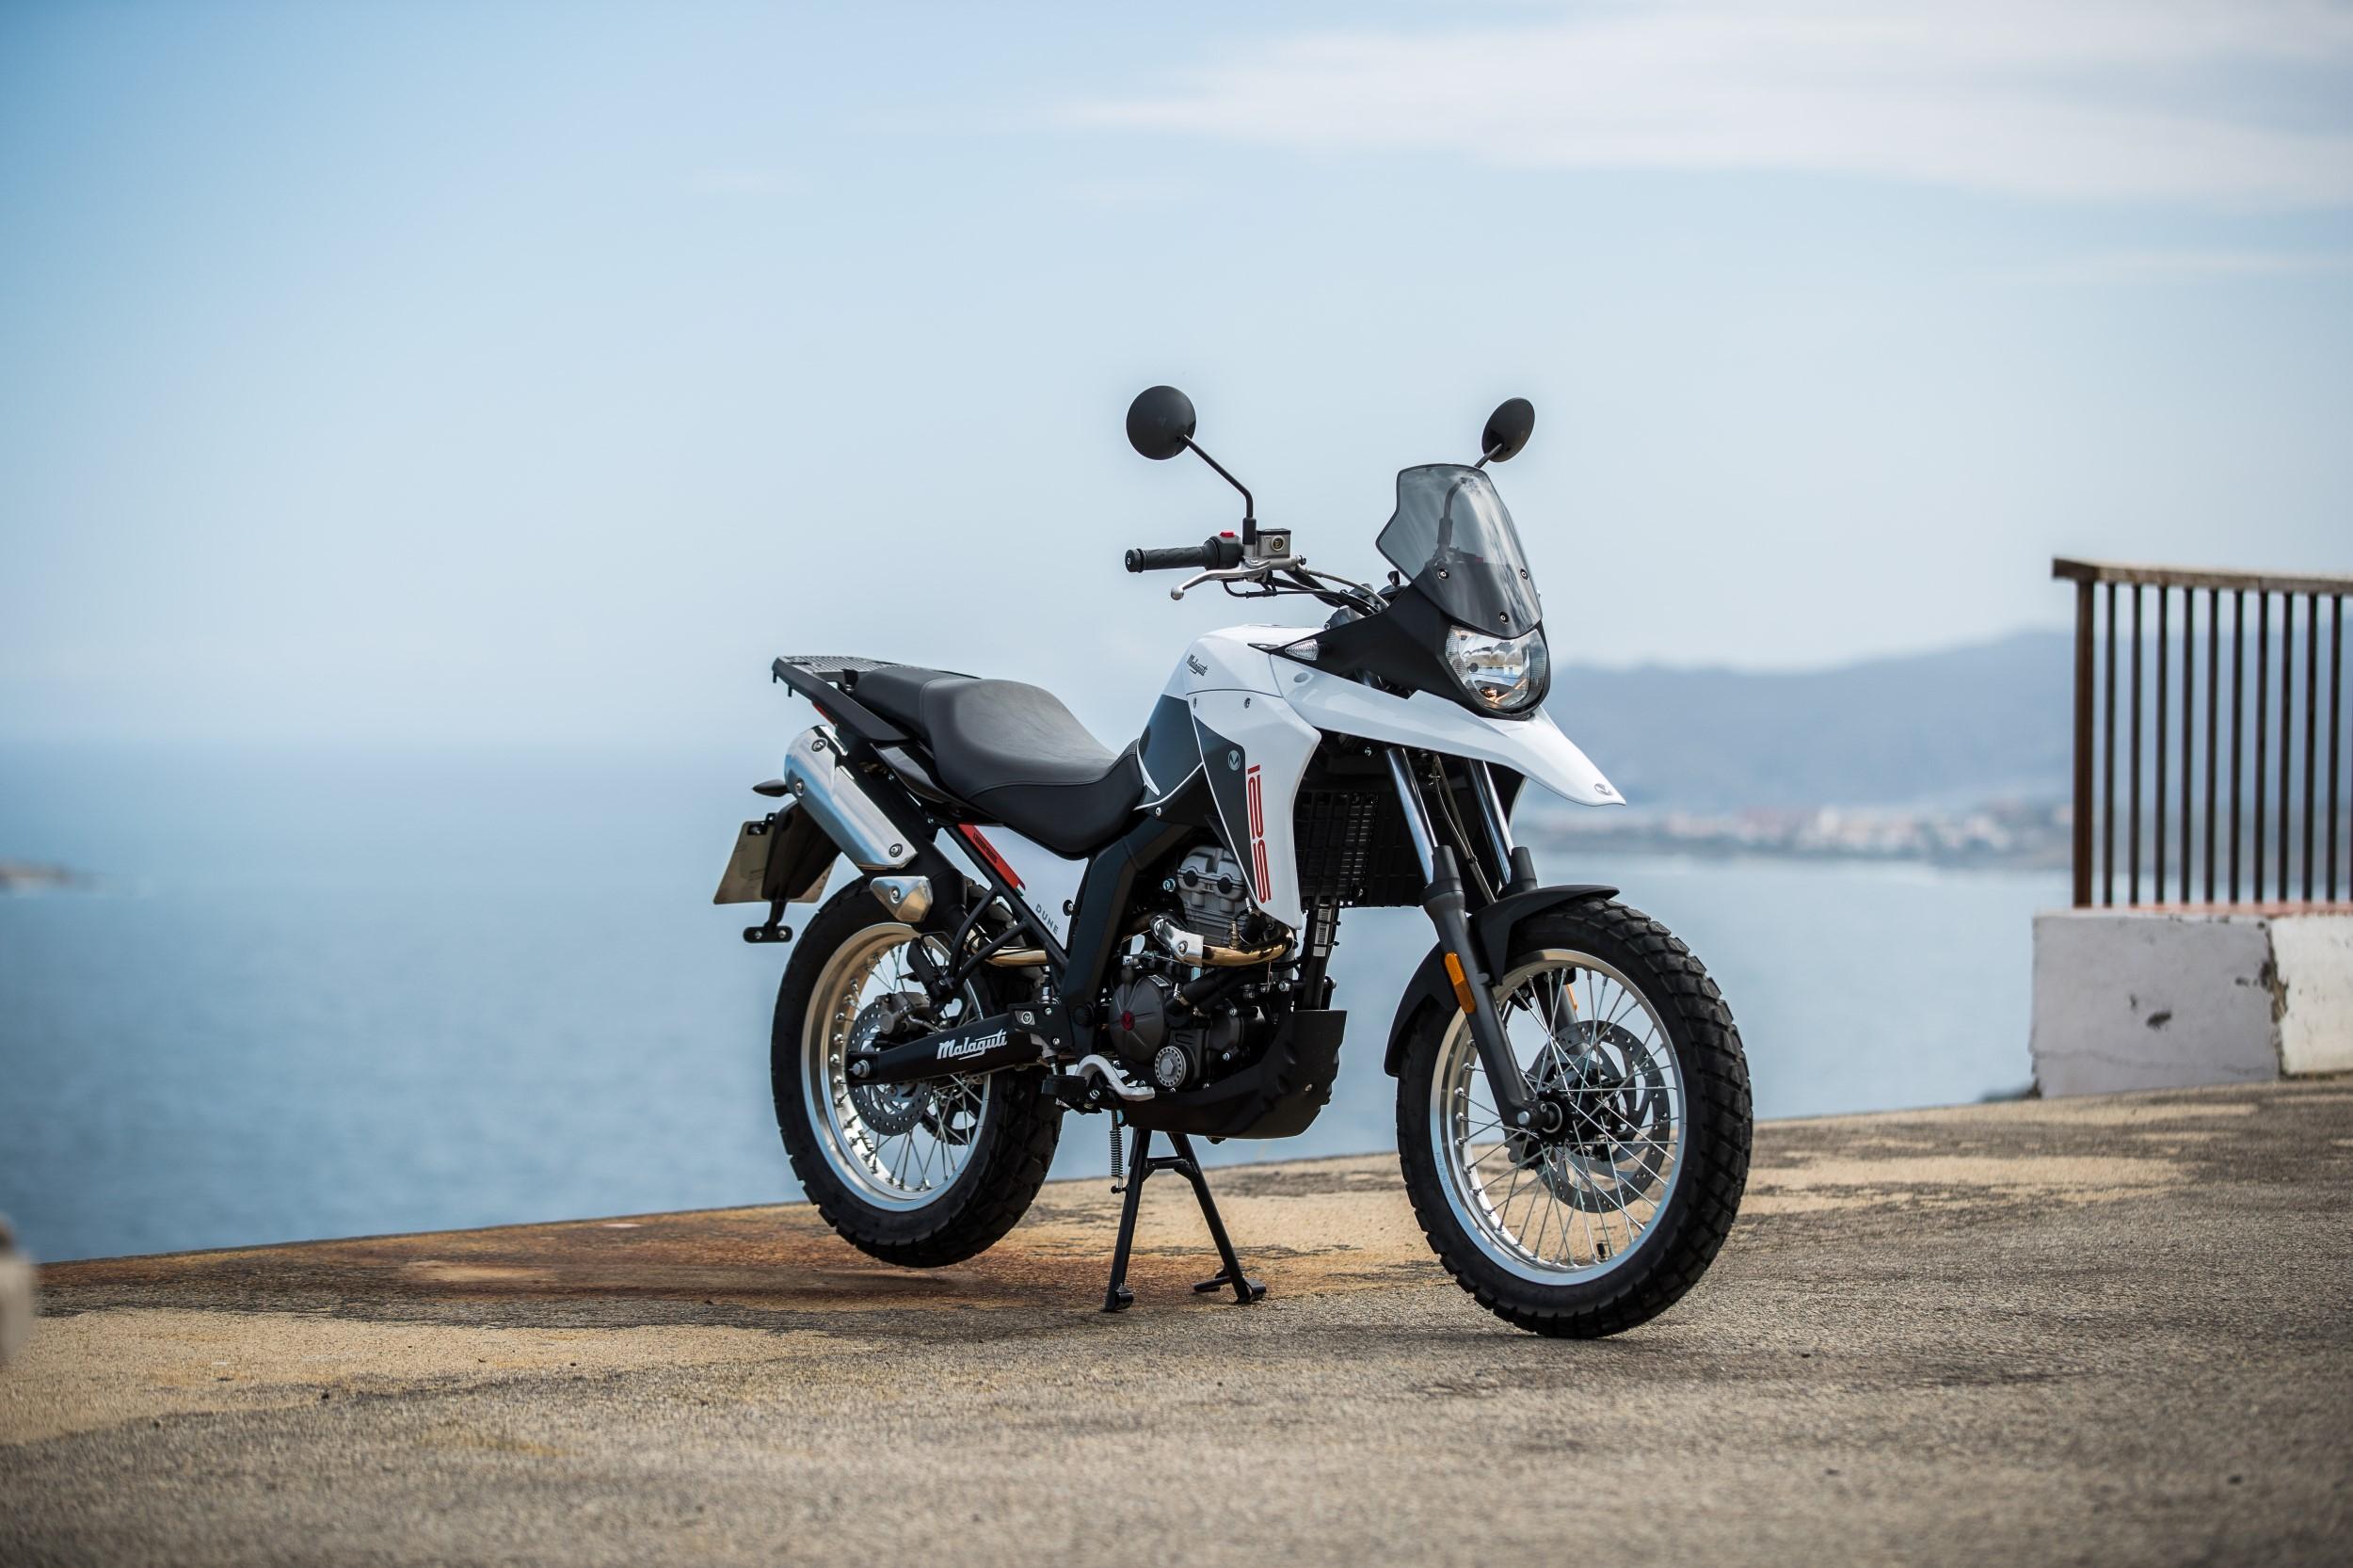 https://malaguti.bike/wp-content/uploads/sites/3/2021/08/dune-full.jpg